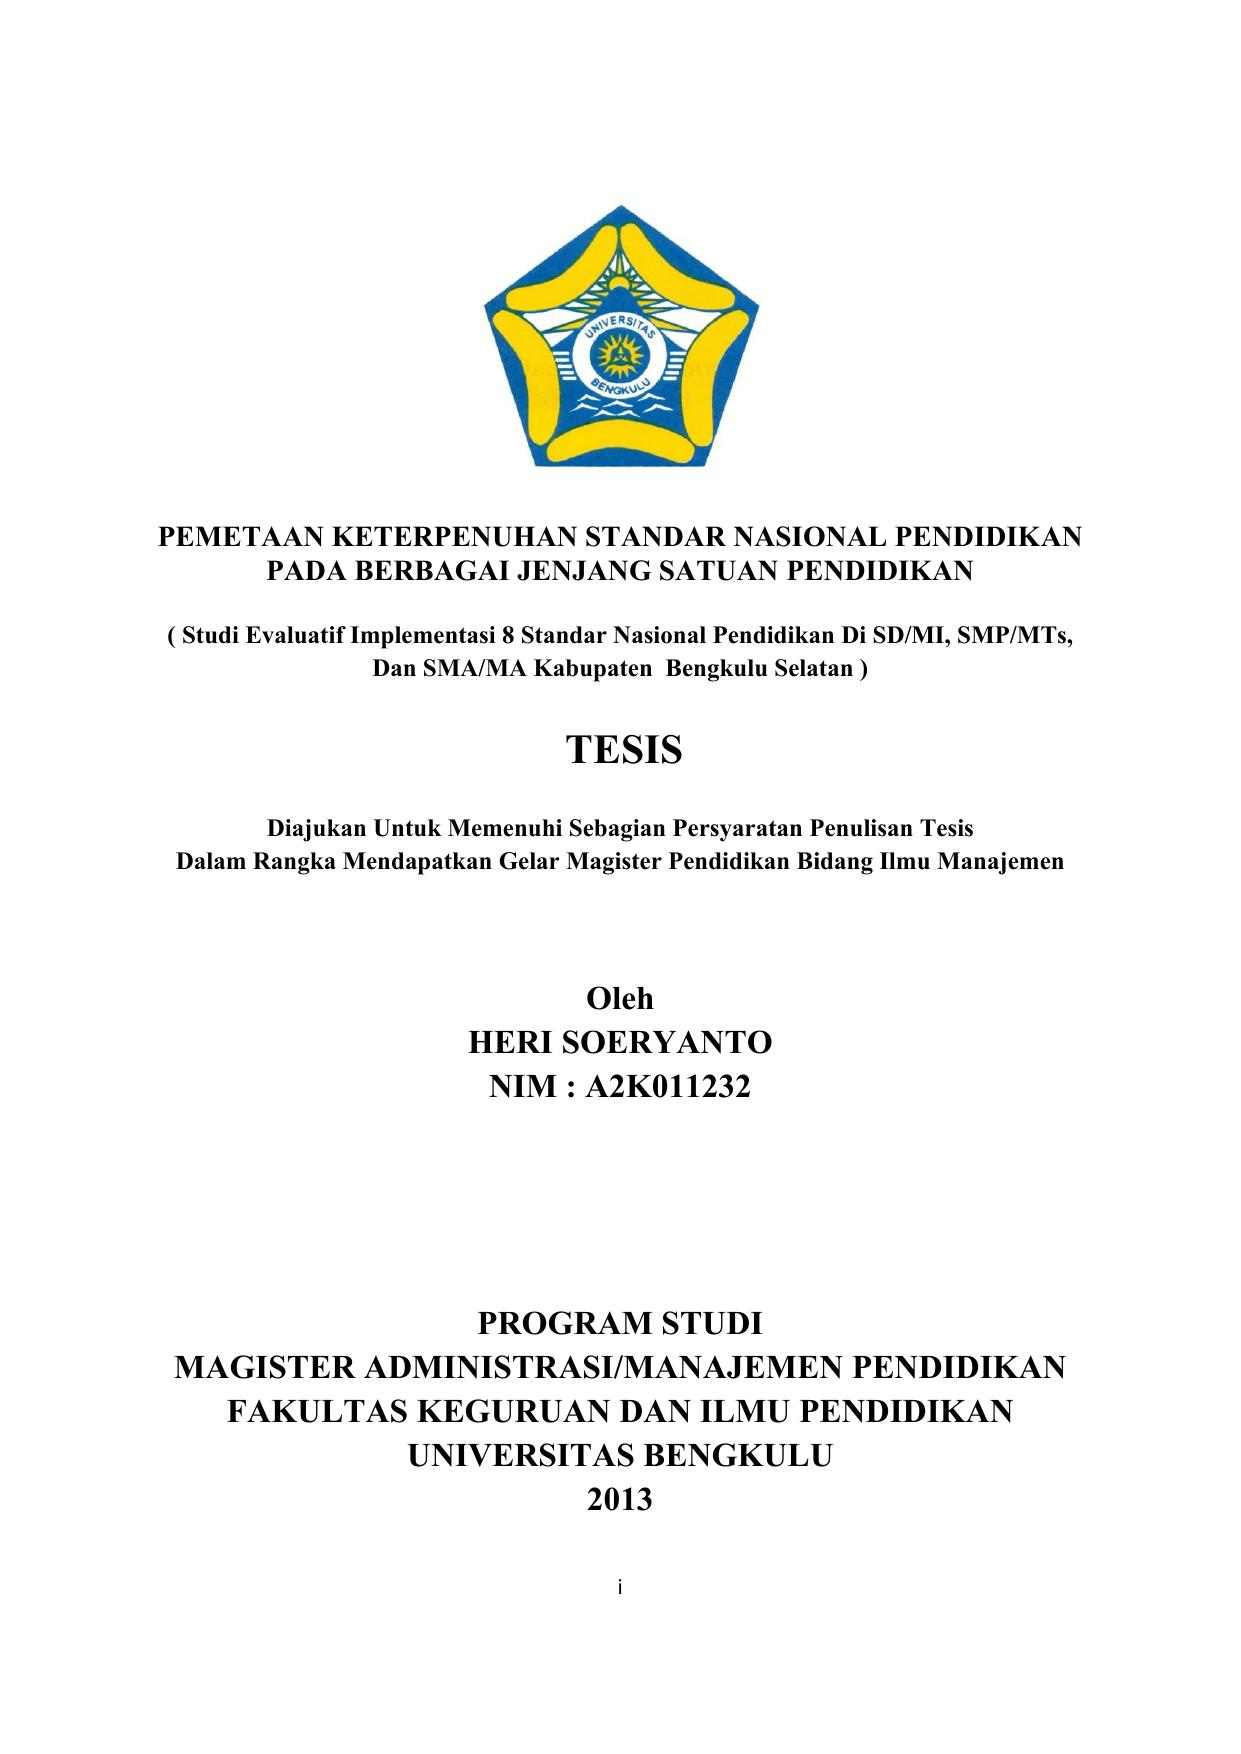 Contoh Proposal Tesis Magister Administrasi Publik Berbagi Contoh Proposal